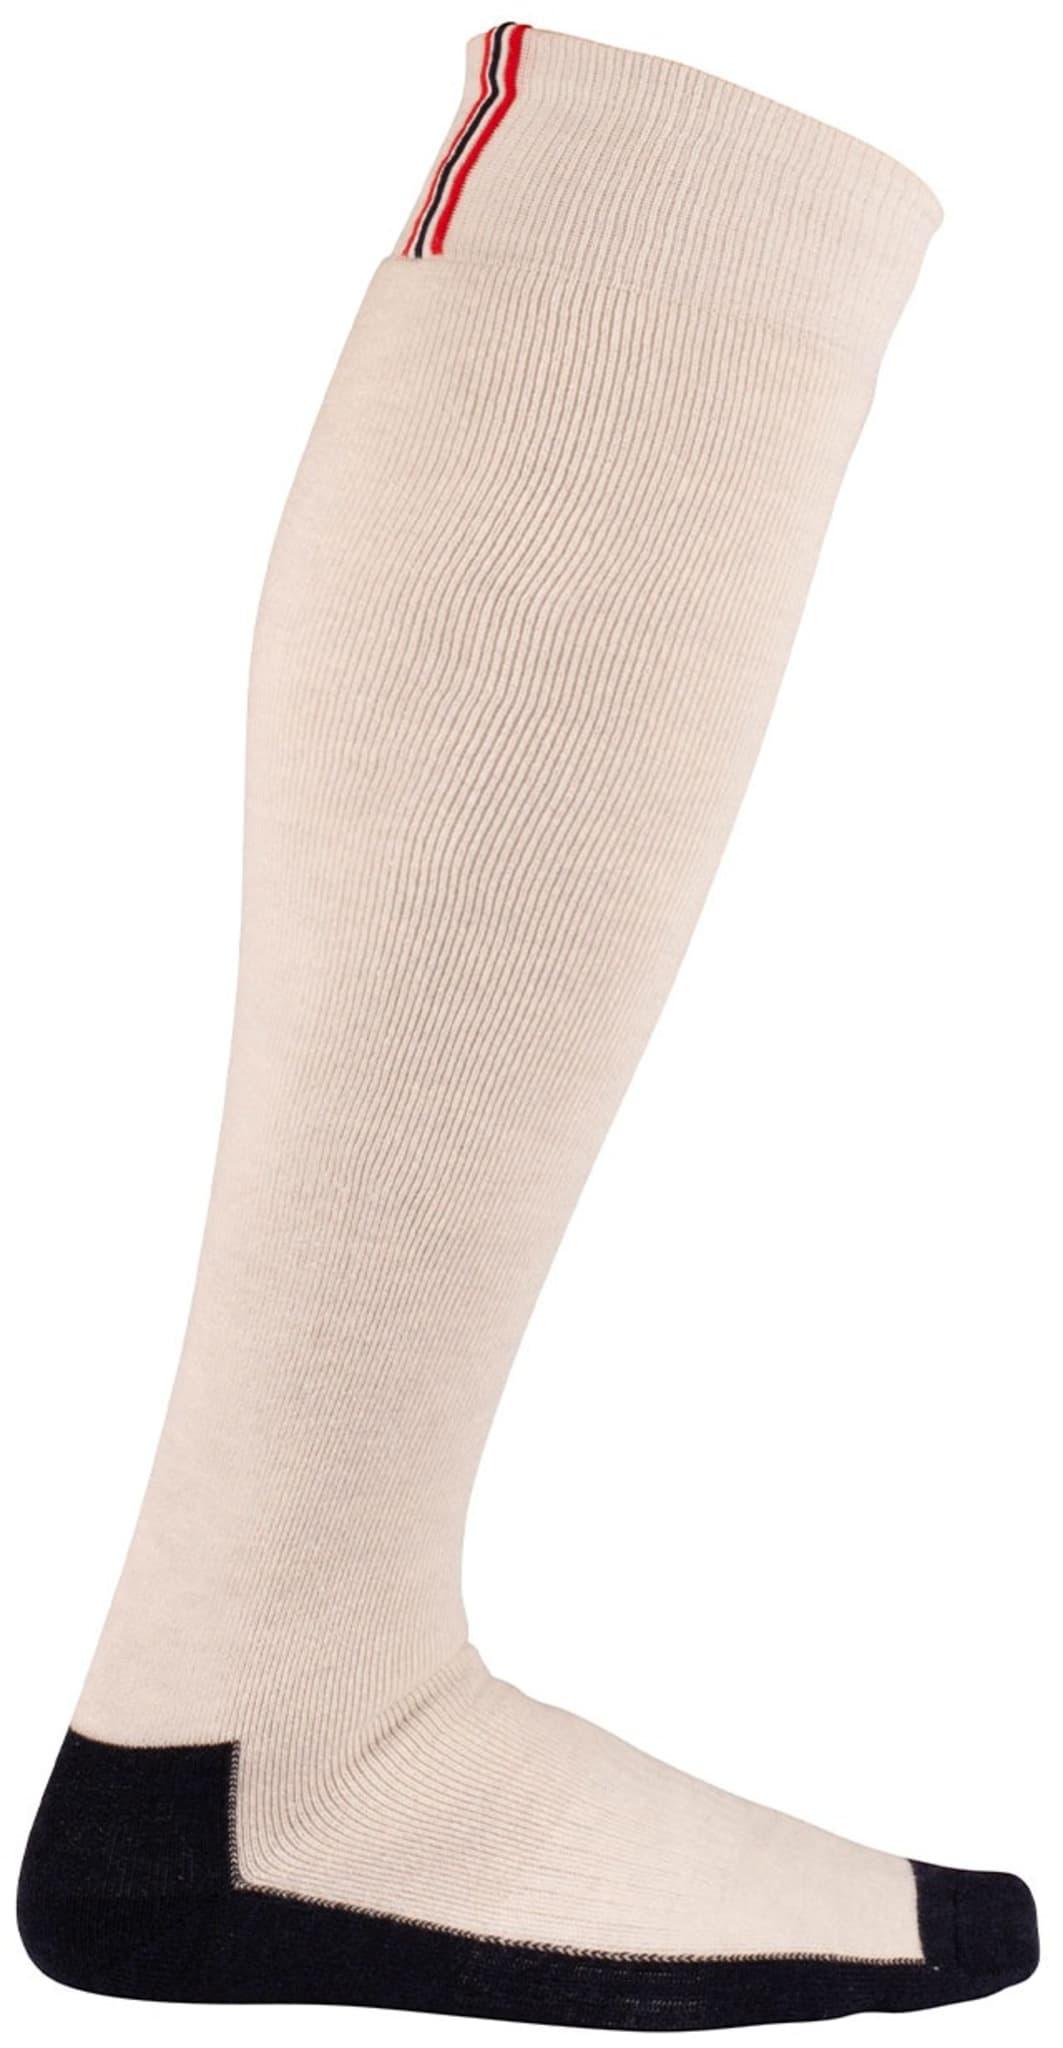 Comfy Sock Unisex